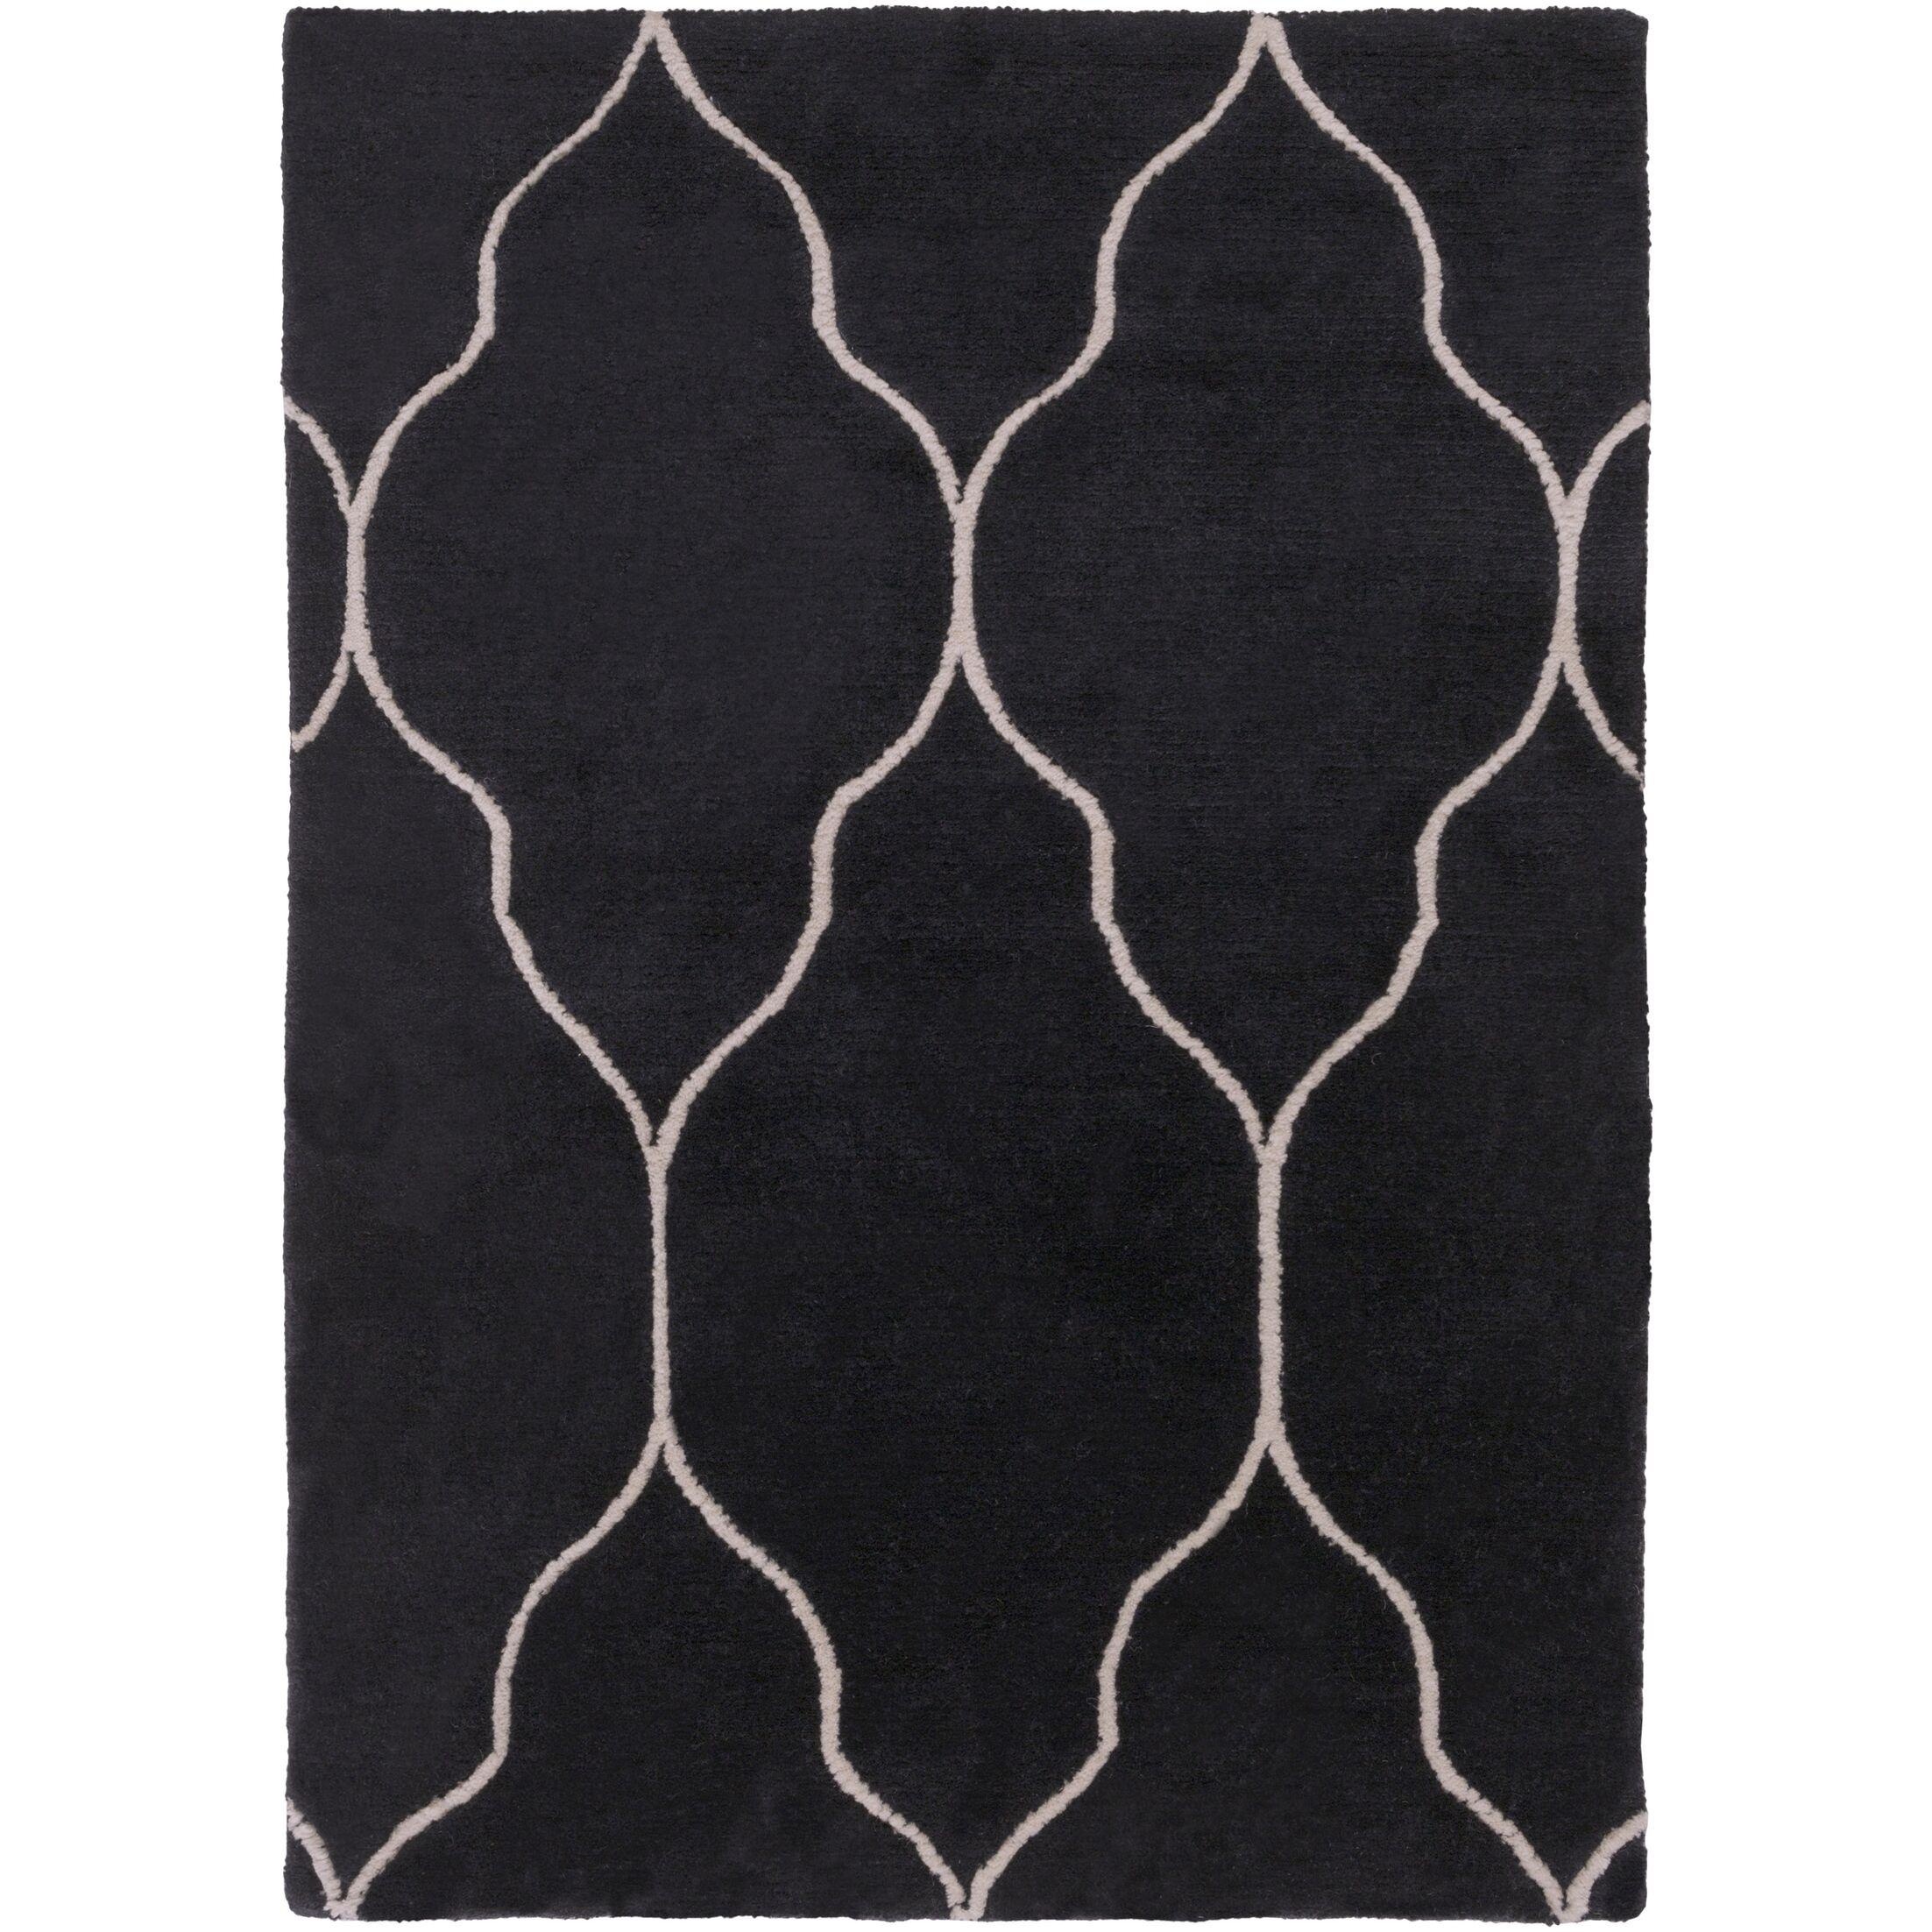 Moreton Hand-Knotted Black/Beige Area Rug Rug Size: Rectangle 9' x 13'